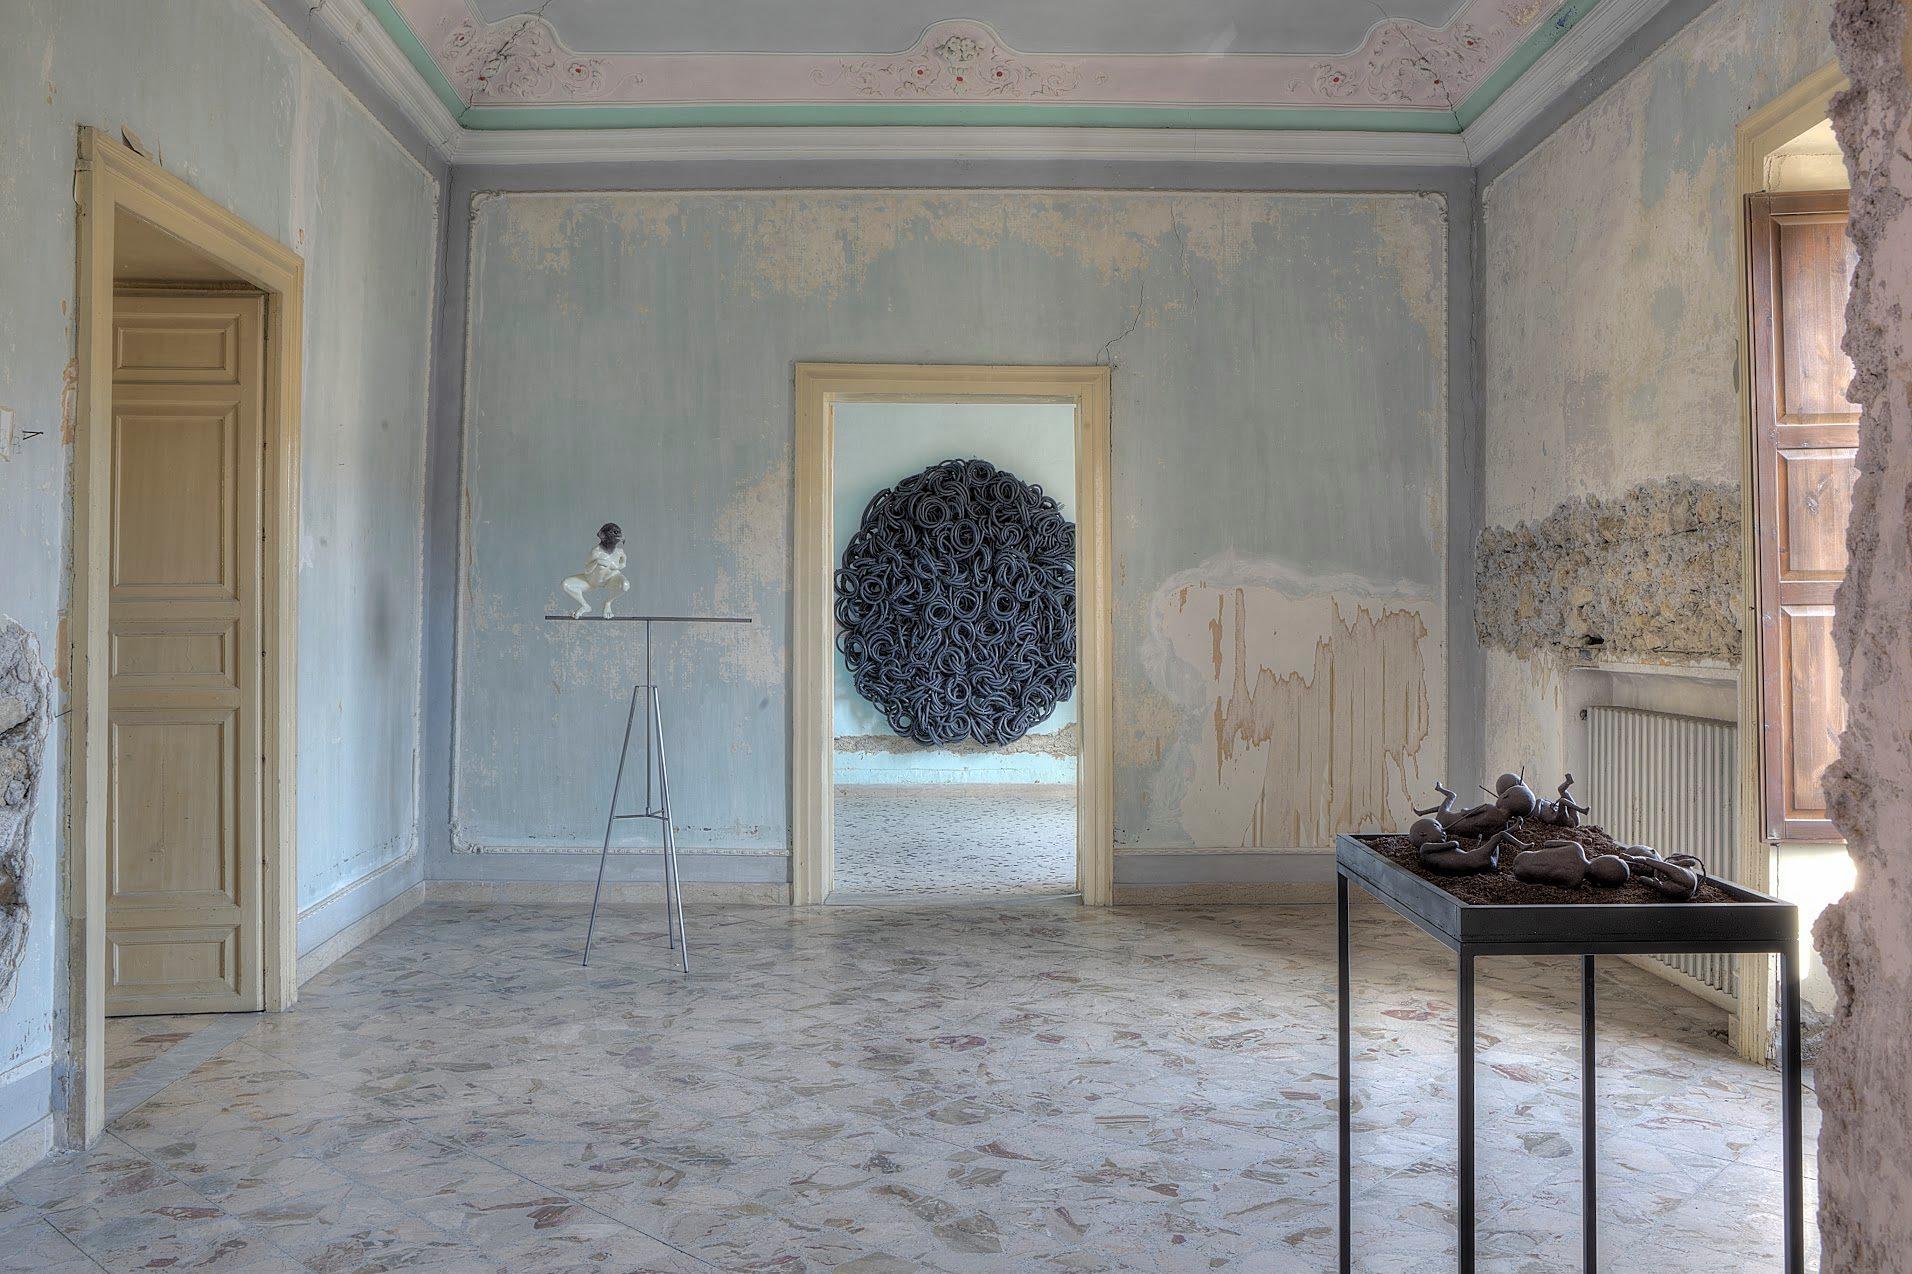 exhibition mostra: 18/10 - muRa, 2016.